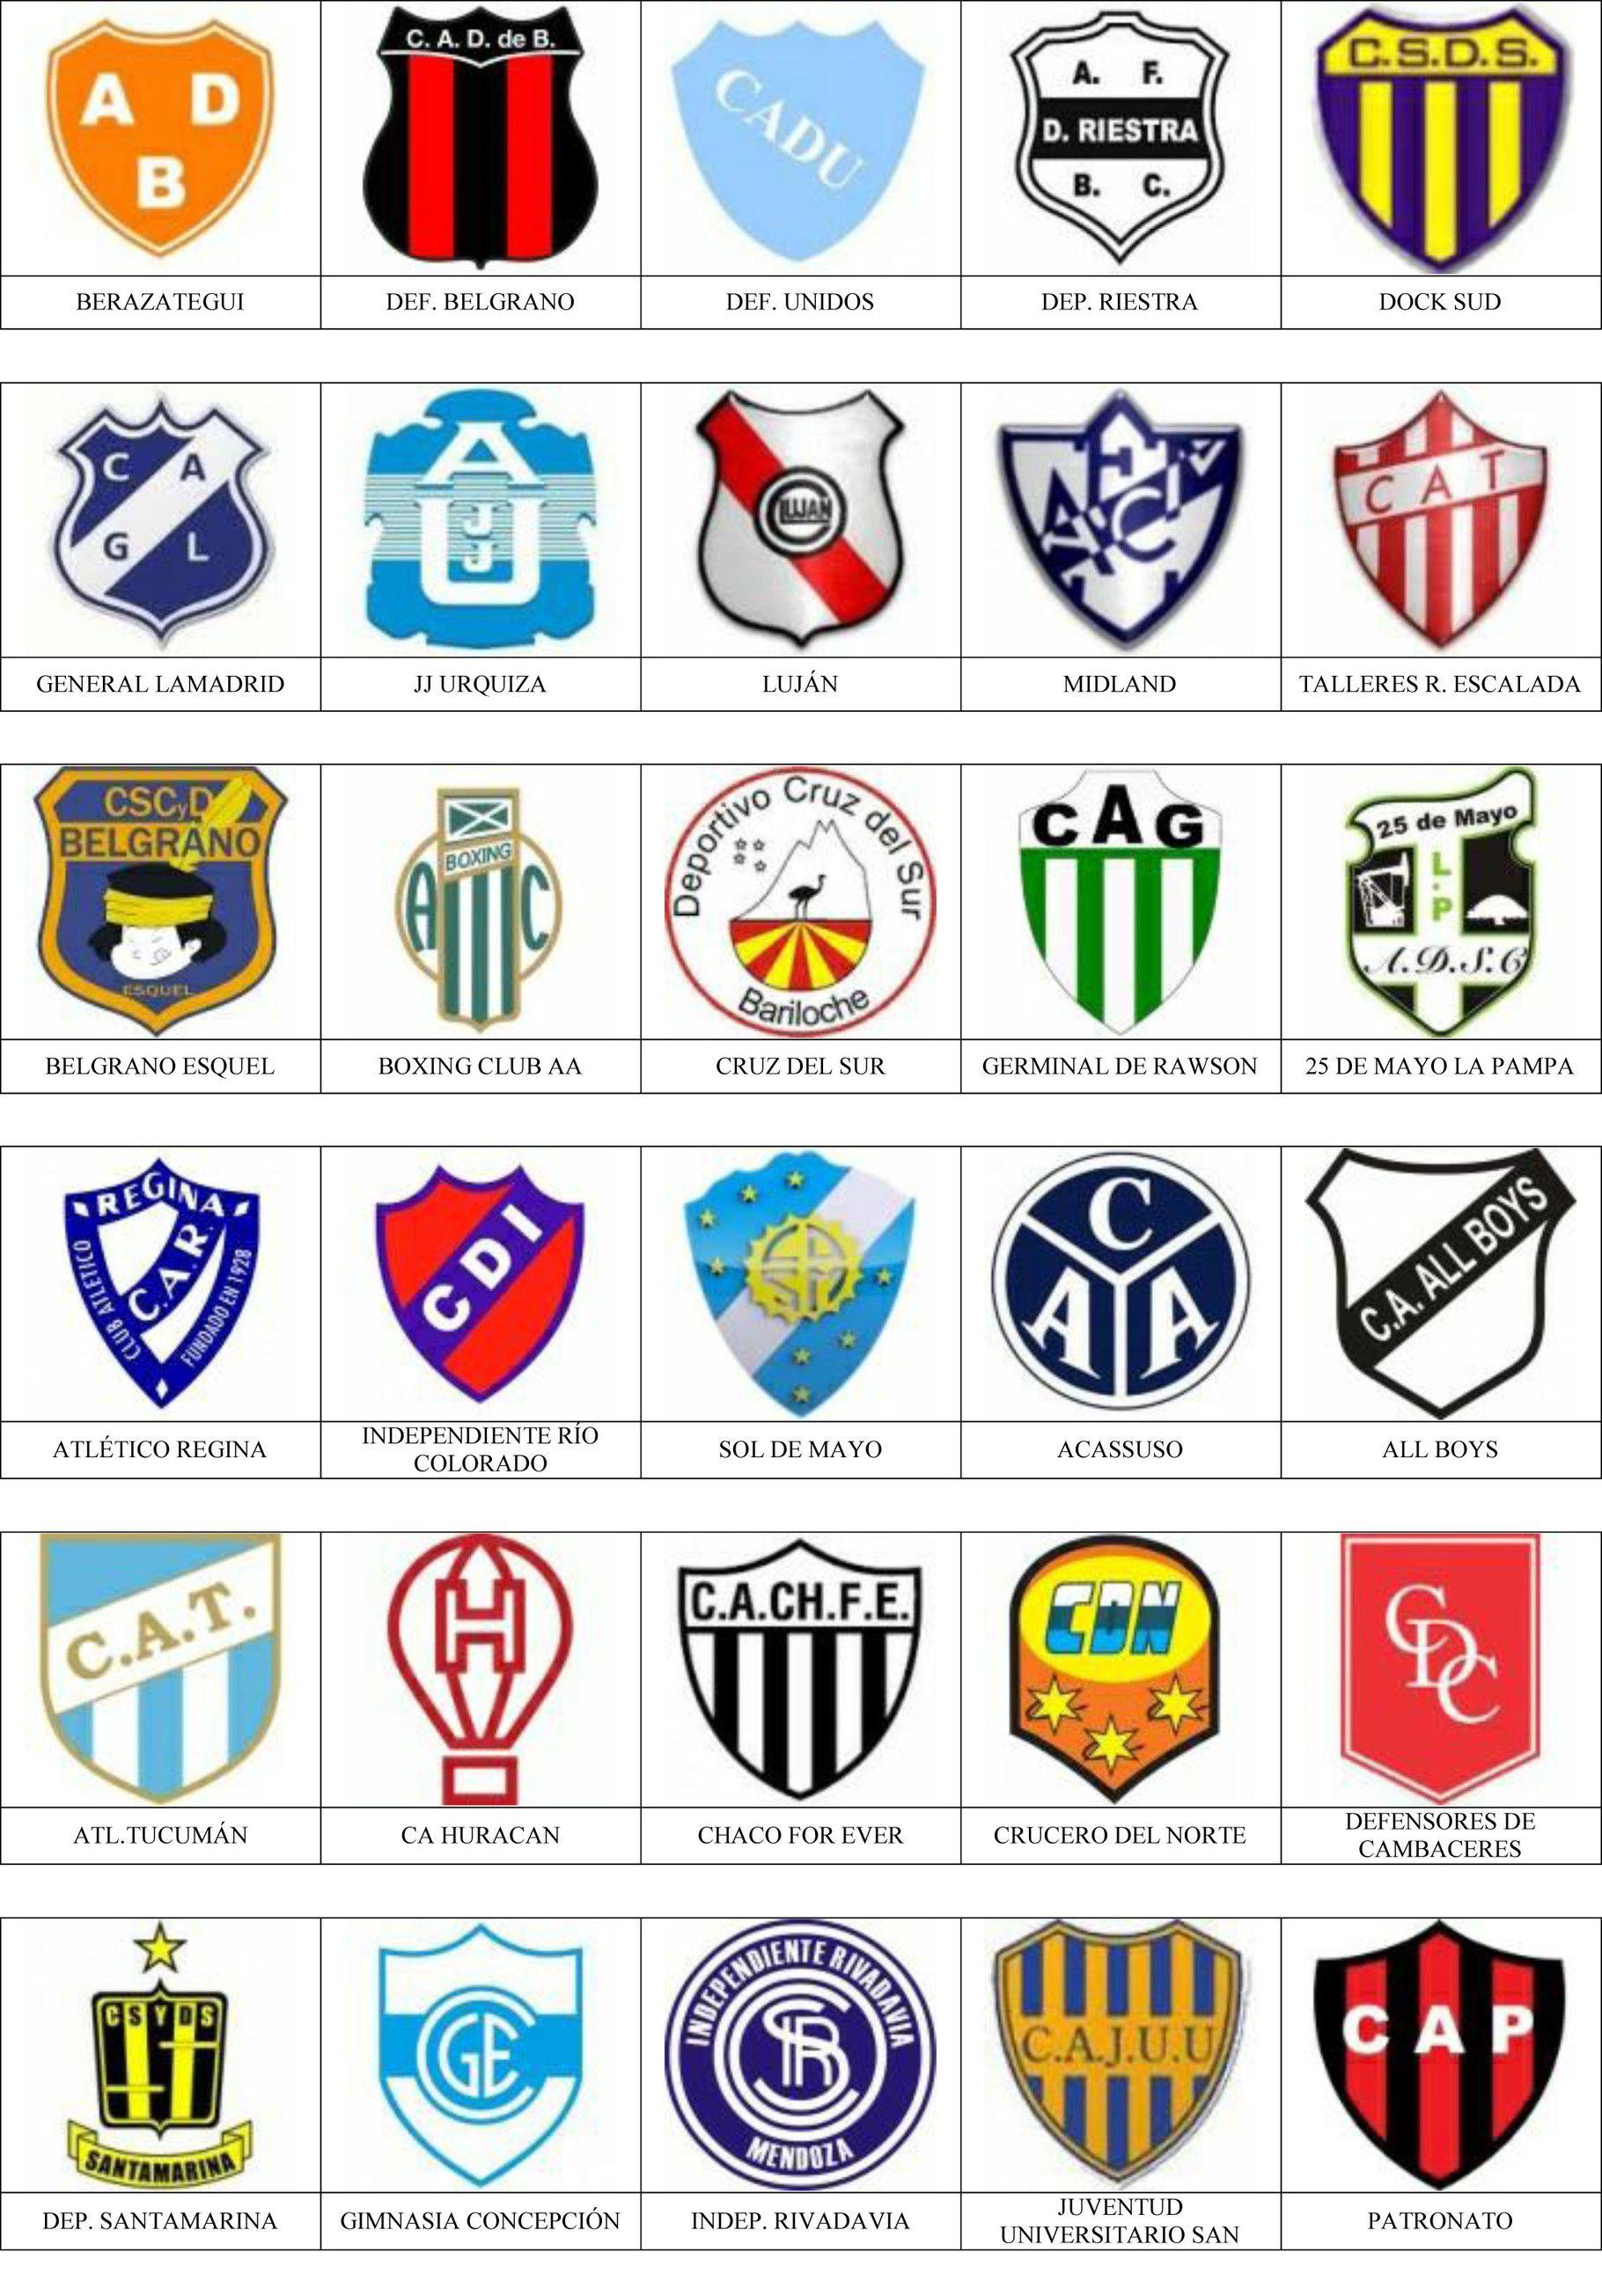 Argentina Pins De Escudos Insiginas De Equipos De Fútbol Escudos De Futbol Argentino Equipo De Fútbol Gimnasia La Plata